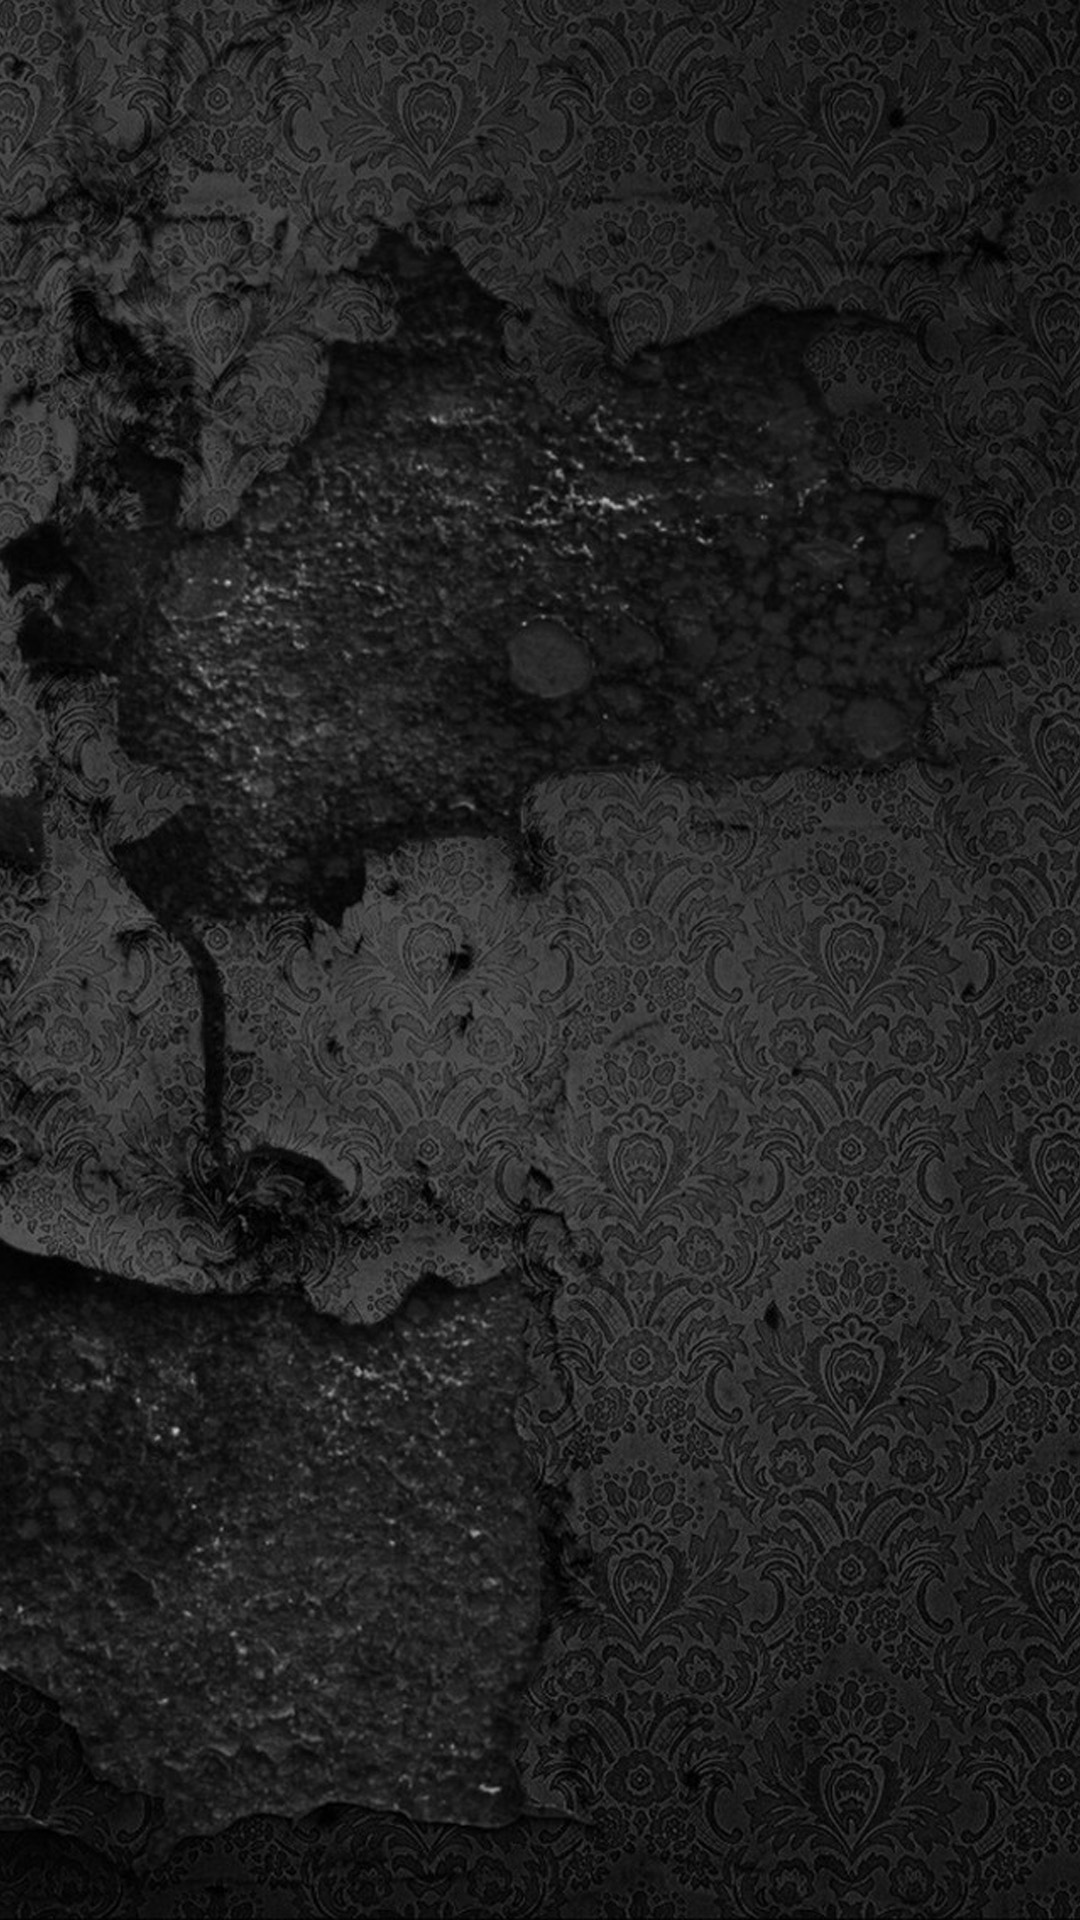 Black Wall Texture iphone 6 plus wallpaper iPhone 6 Plus Wallpaper 1080x1920